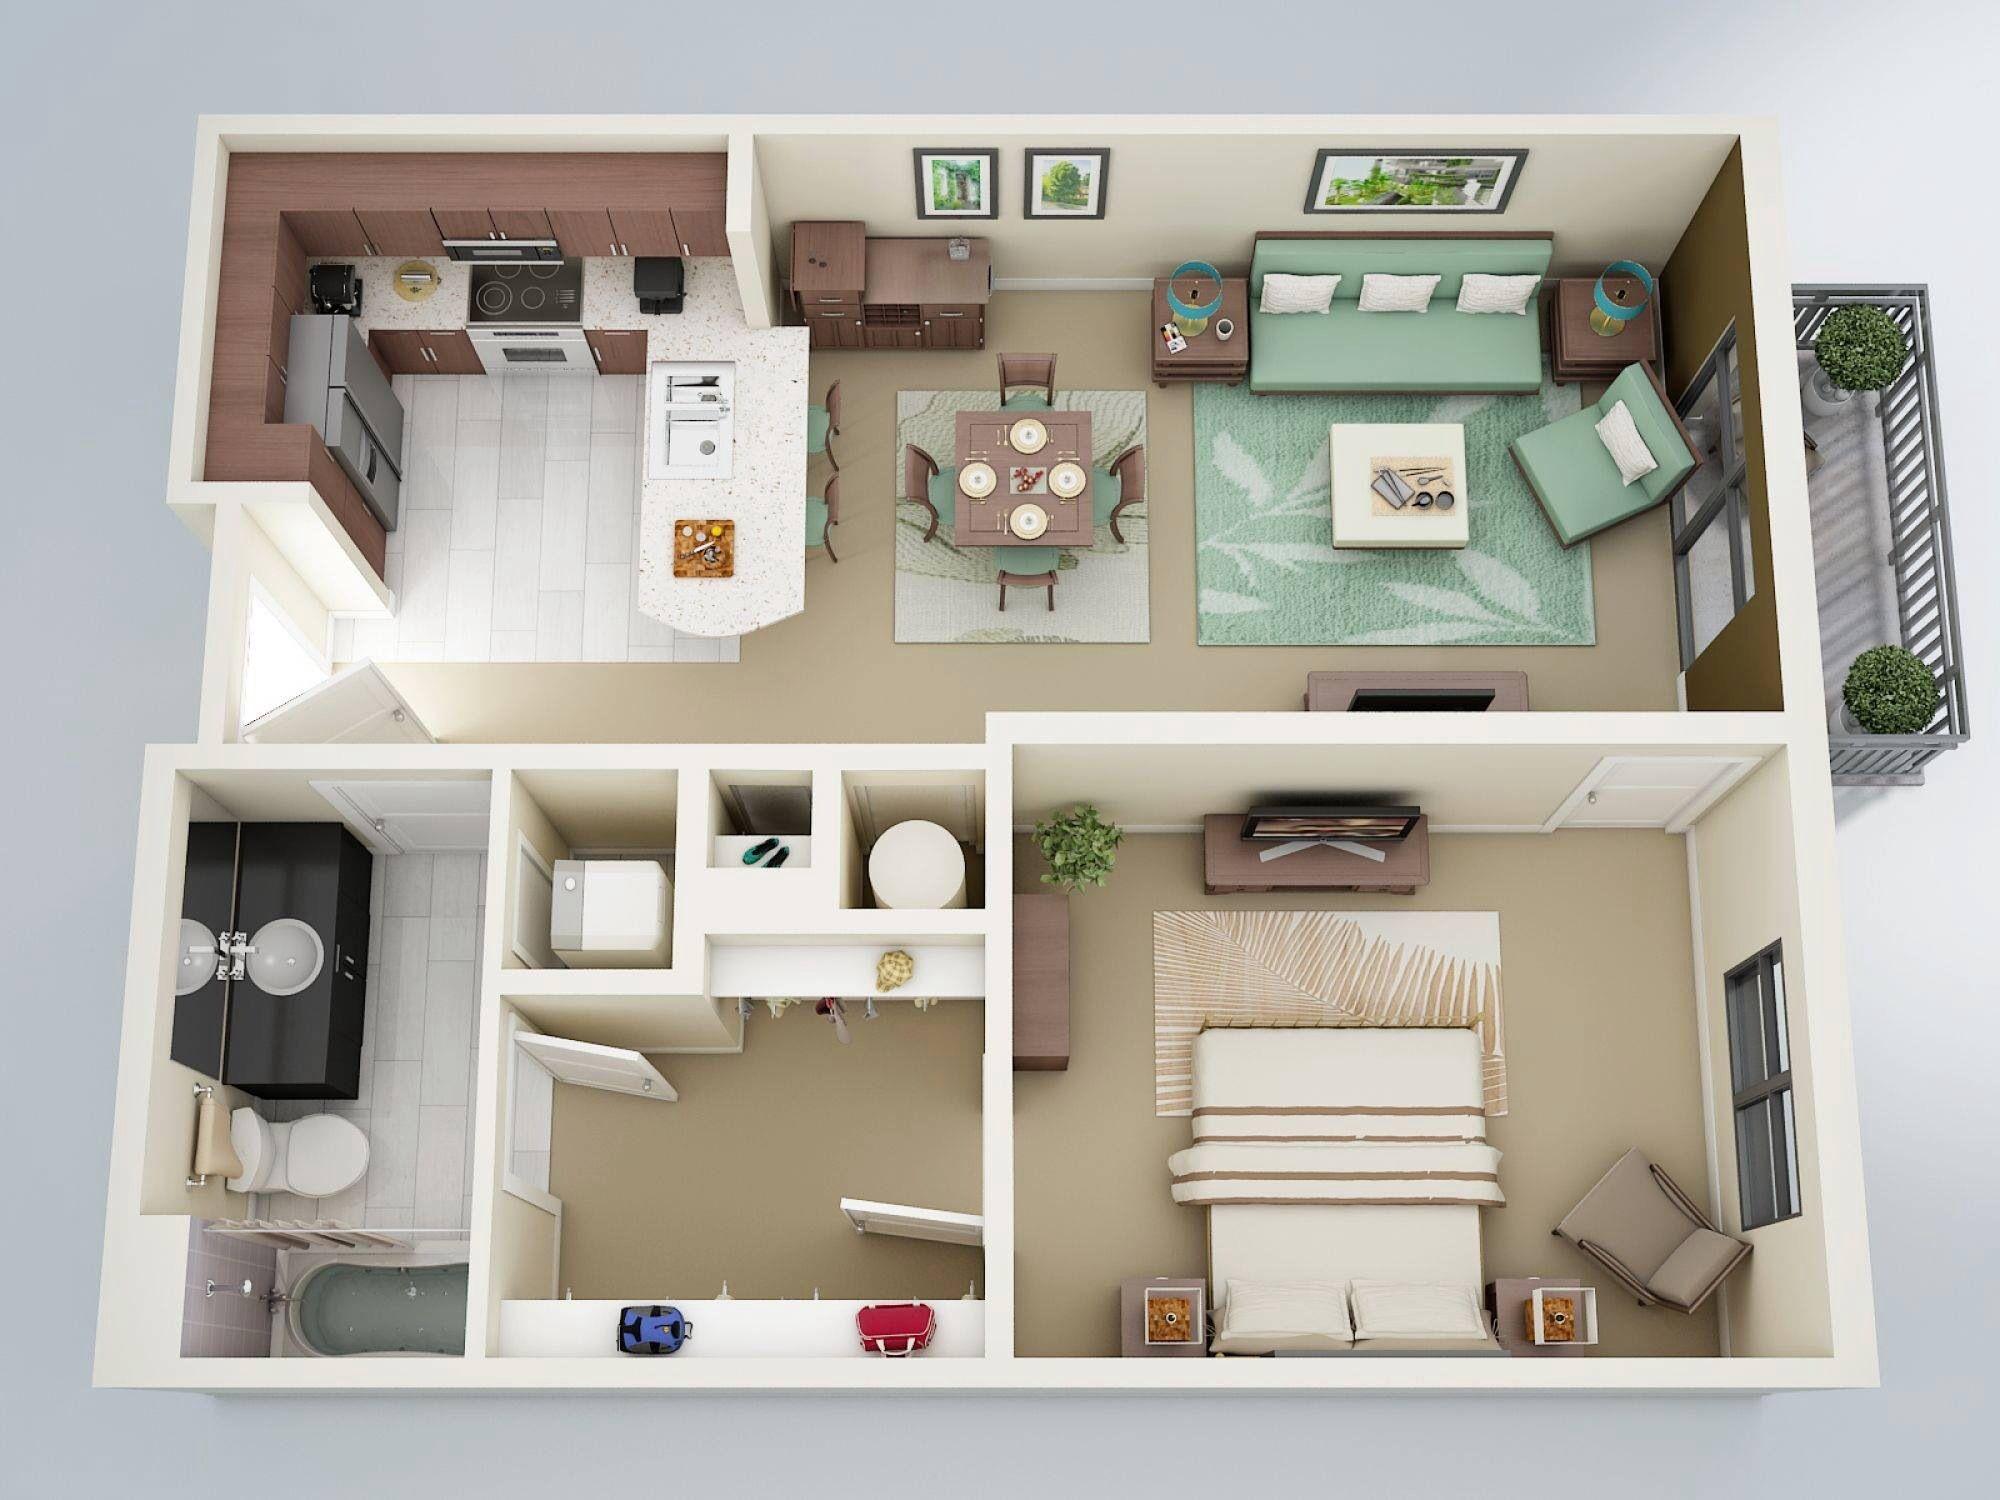 1 Bedroom Flat Interior Design Beauteous 1 Bed Apartment  A Space Apart  Pinterest  Apartments House Design Inspiration